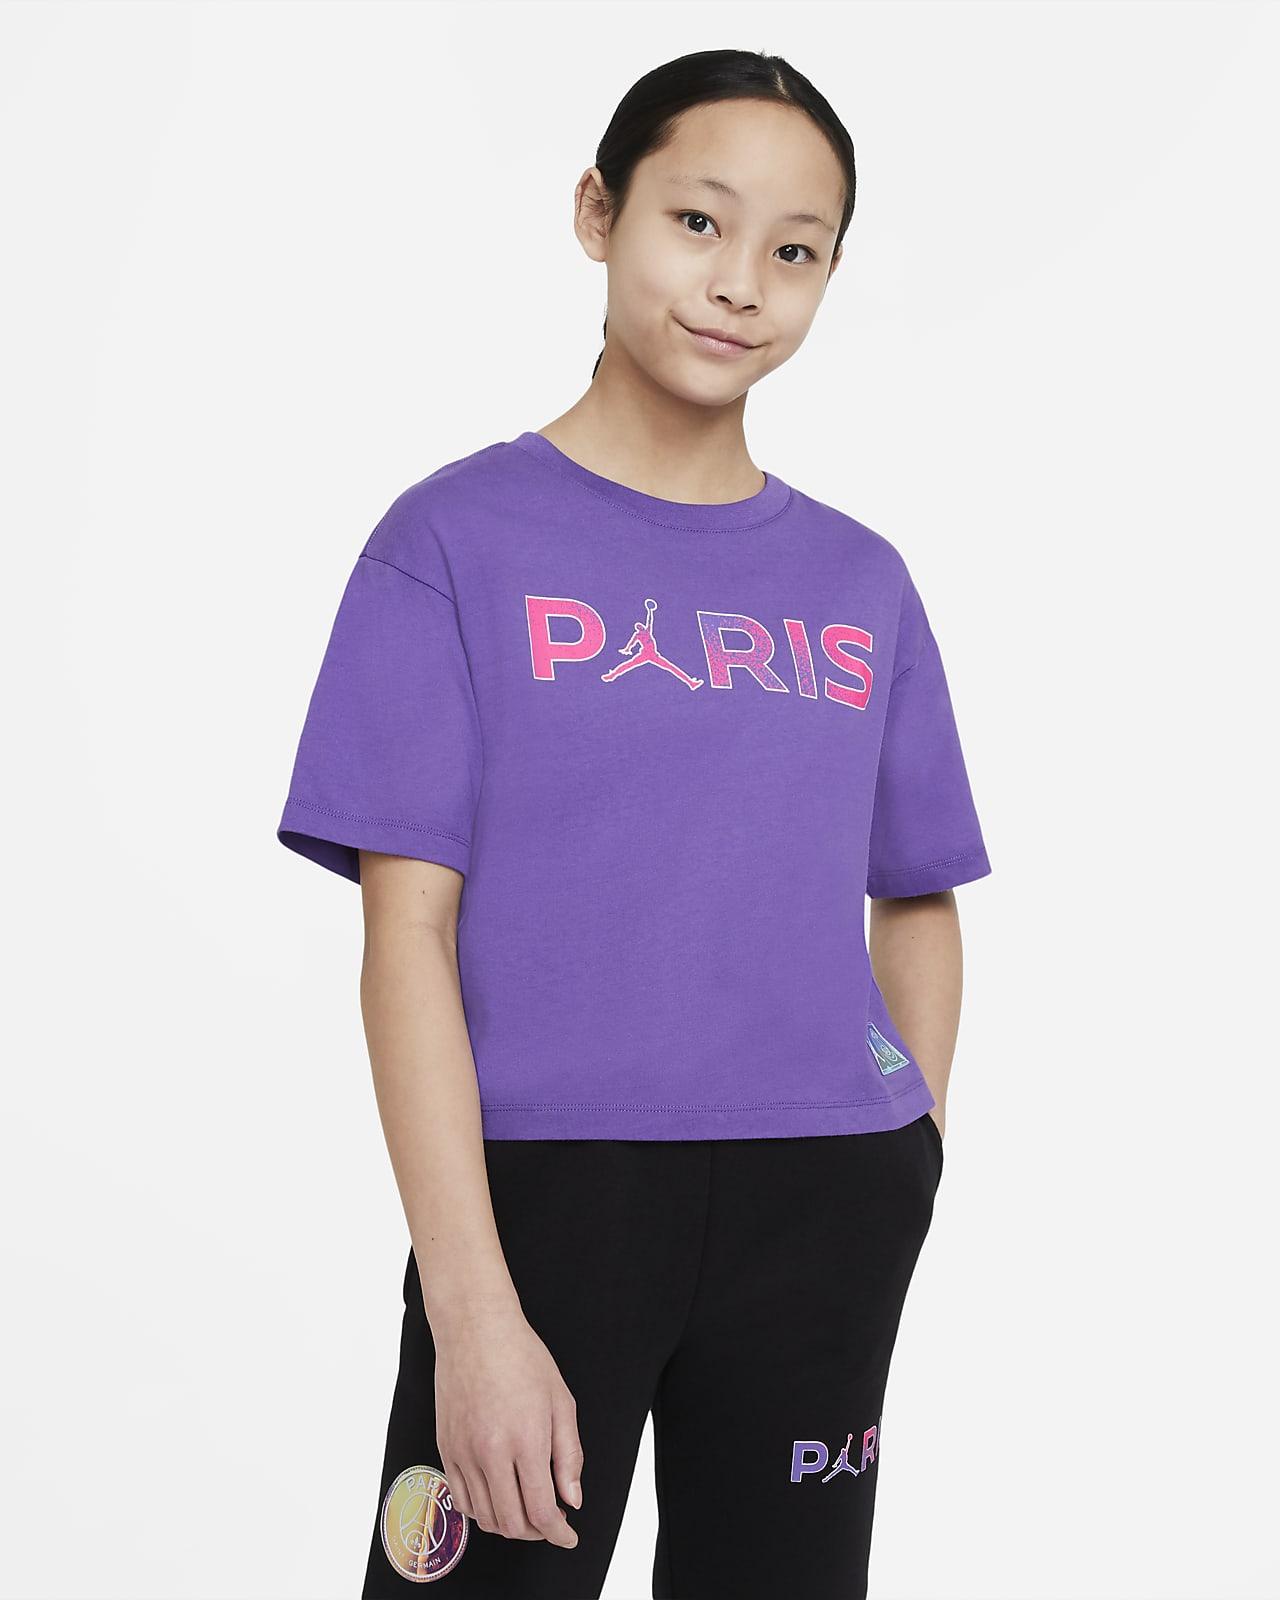 T-shirt Paris Saint-Germain för ungdom (tjejer)